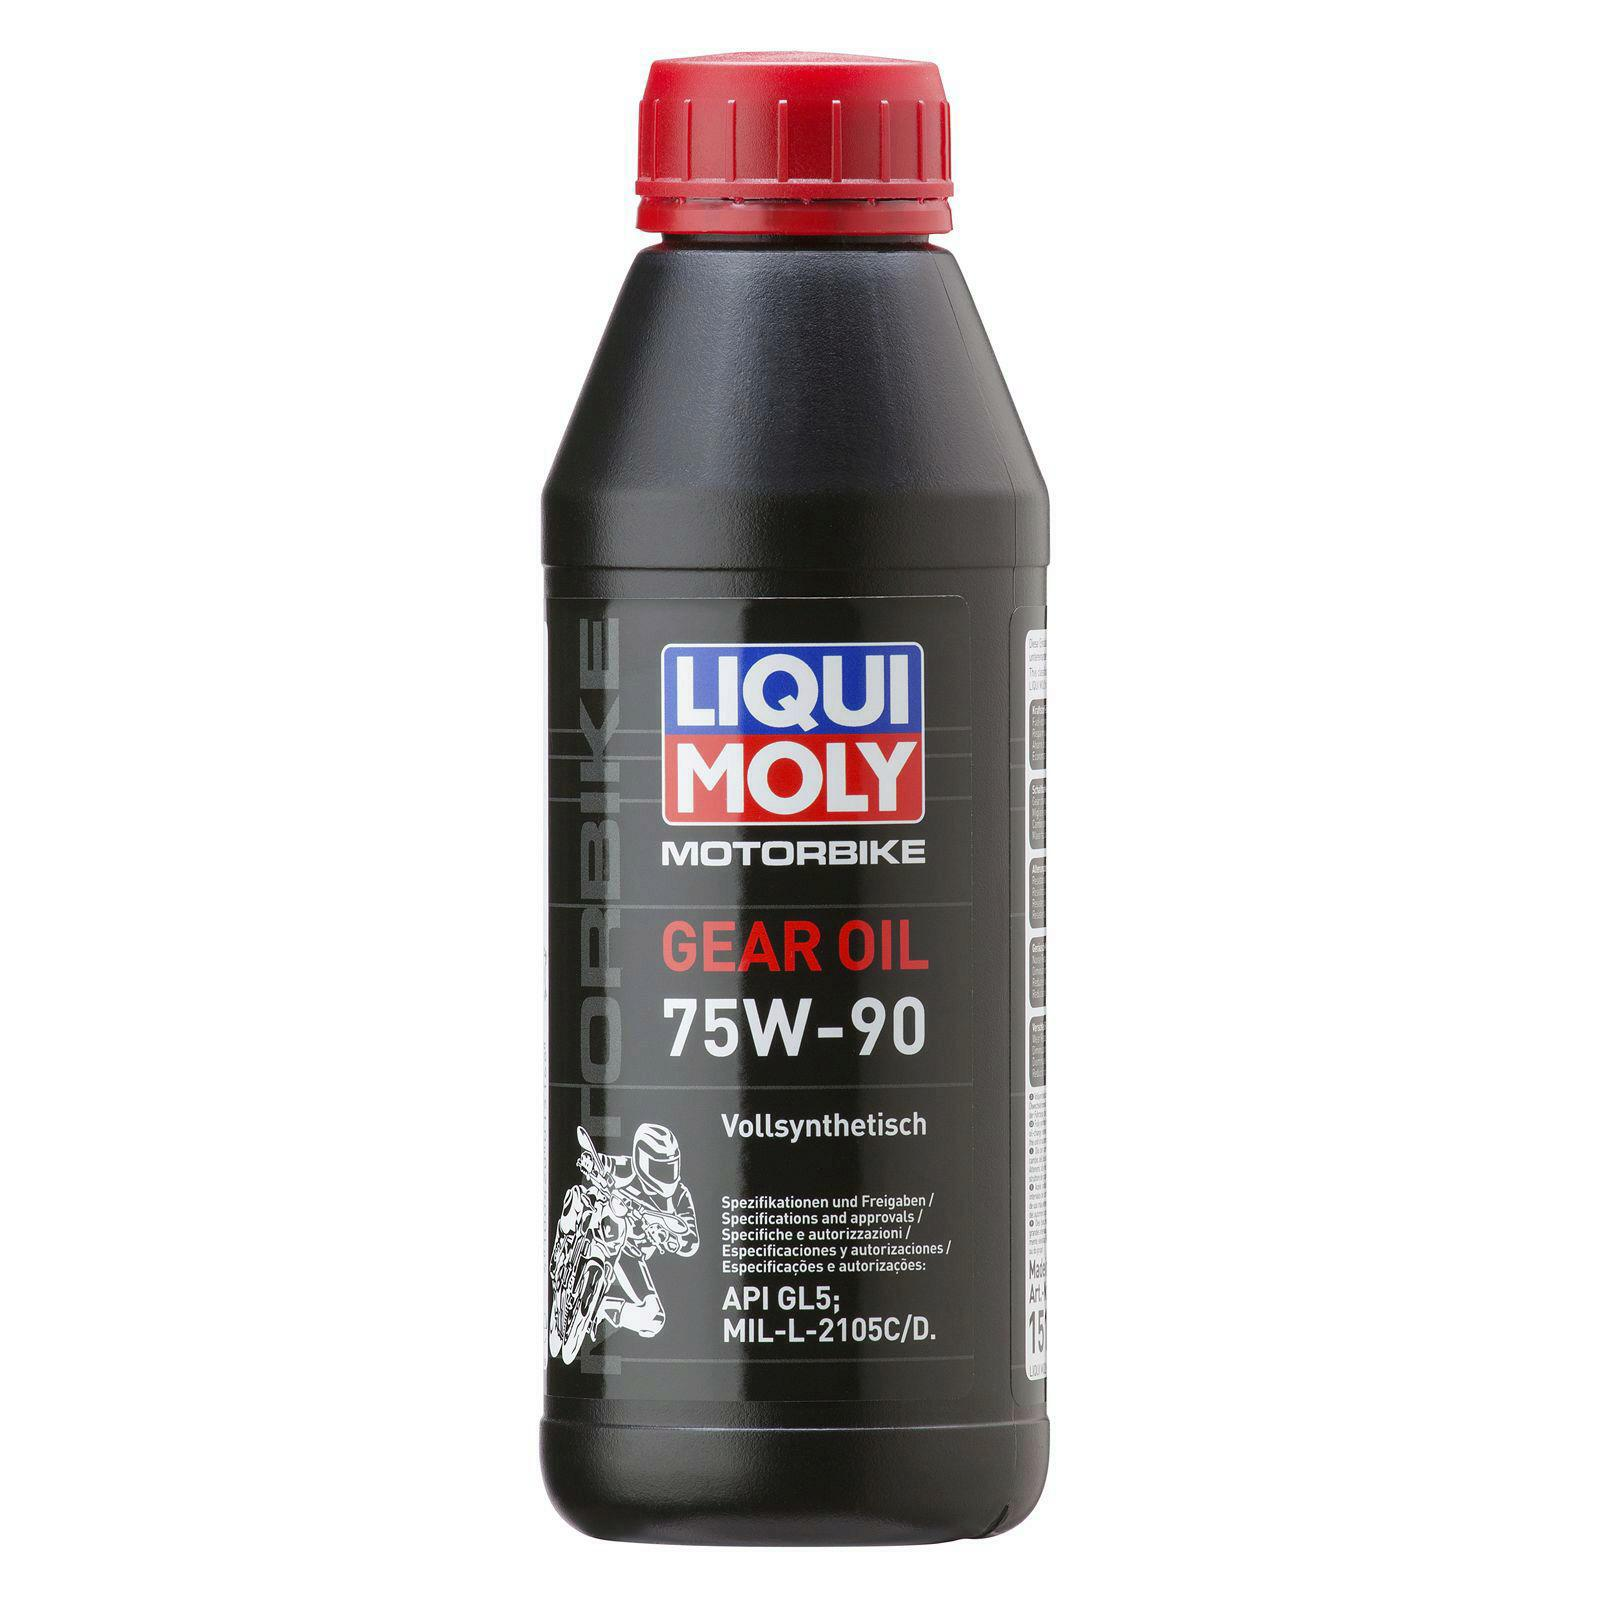 Liqui Moly Motorbike Gear Öl 75W-90 500ml